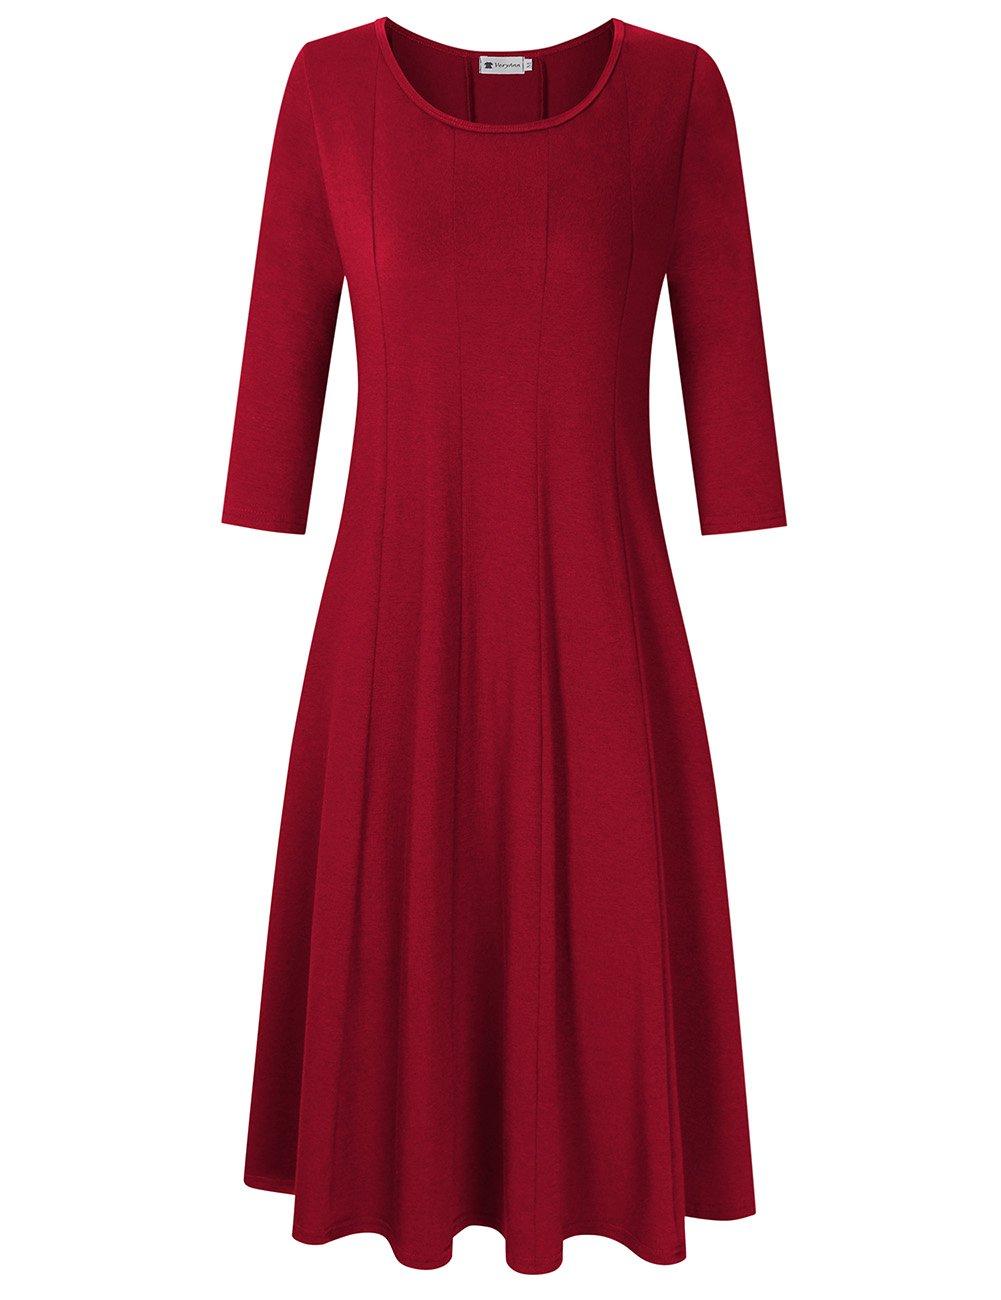 VeryAnn Women's Midi Dress 3/4 Sleeve Splice Long Dresses Wine Red M